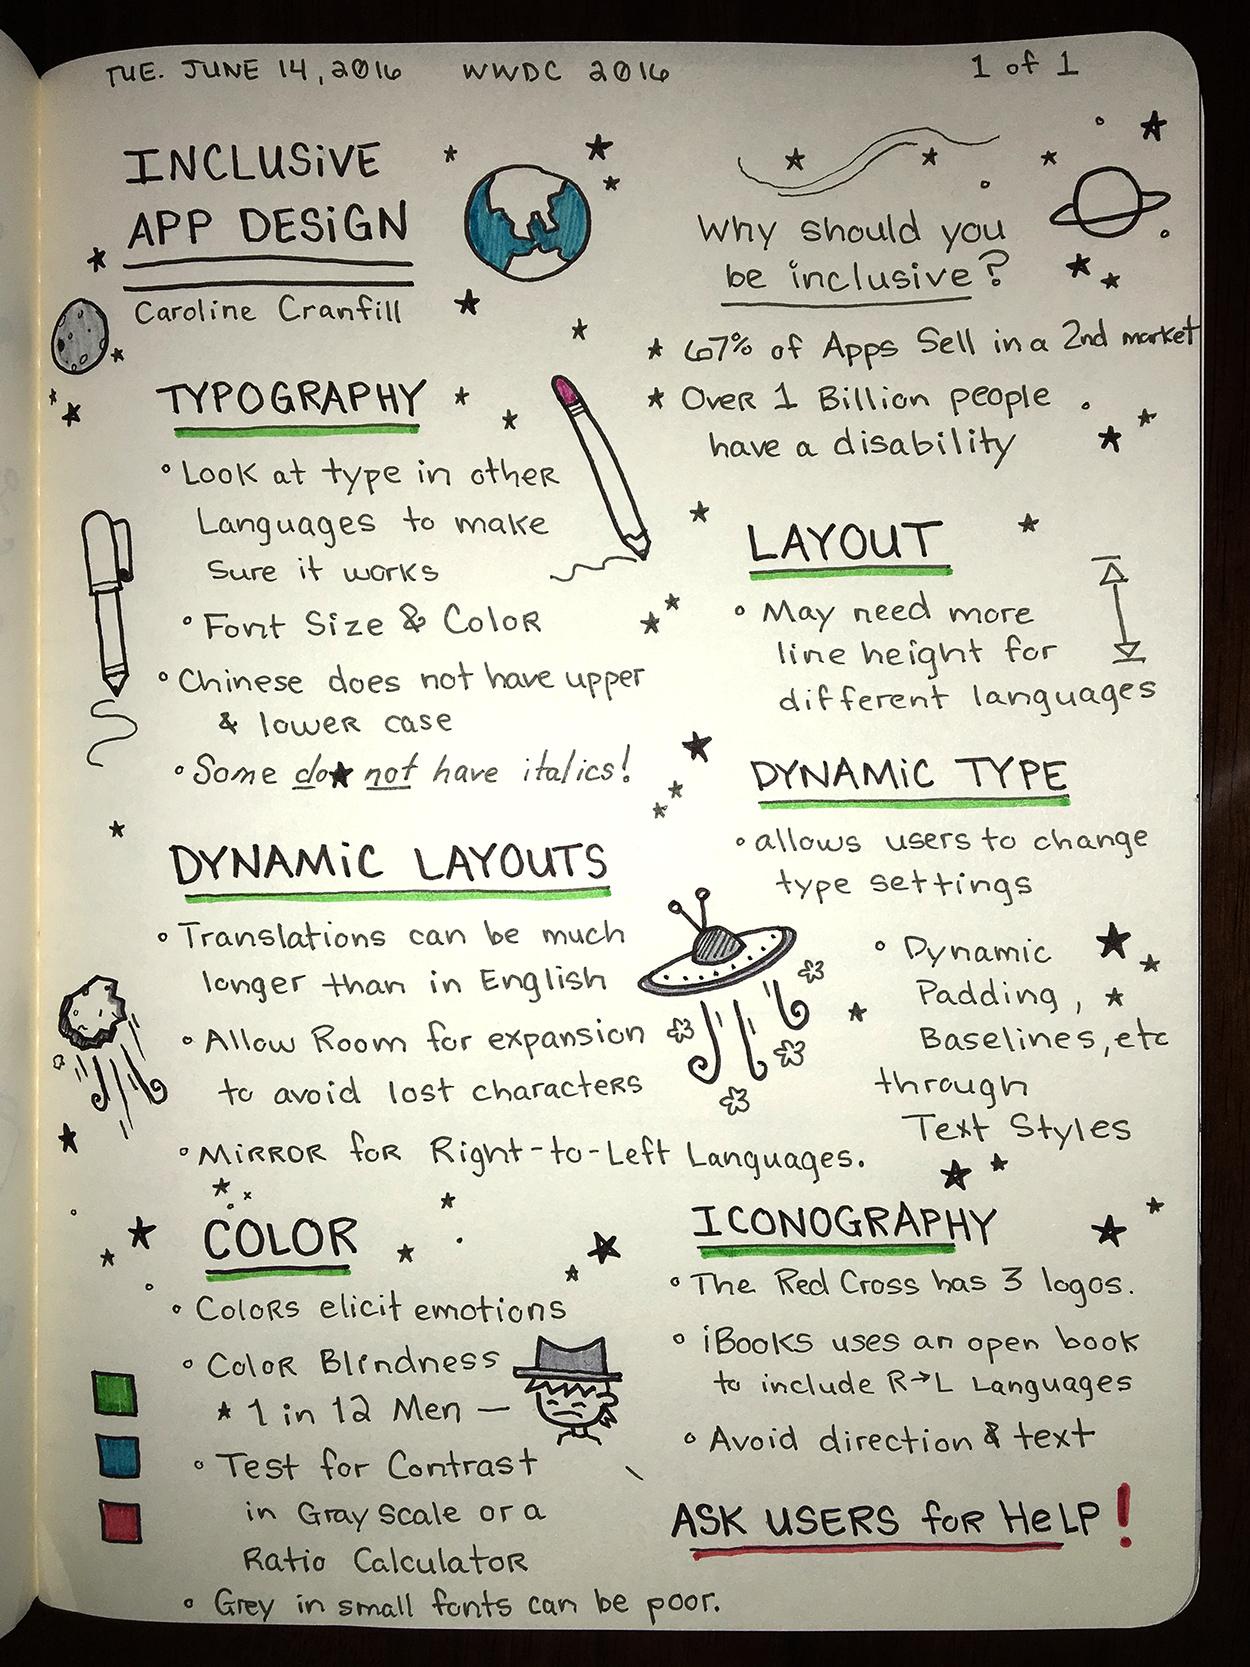 WWDC sketchnotes - Inclusive App Design